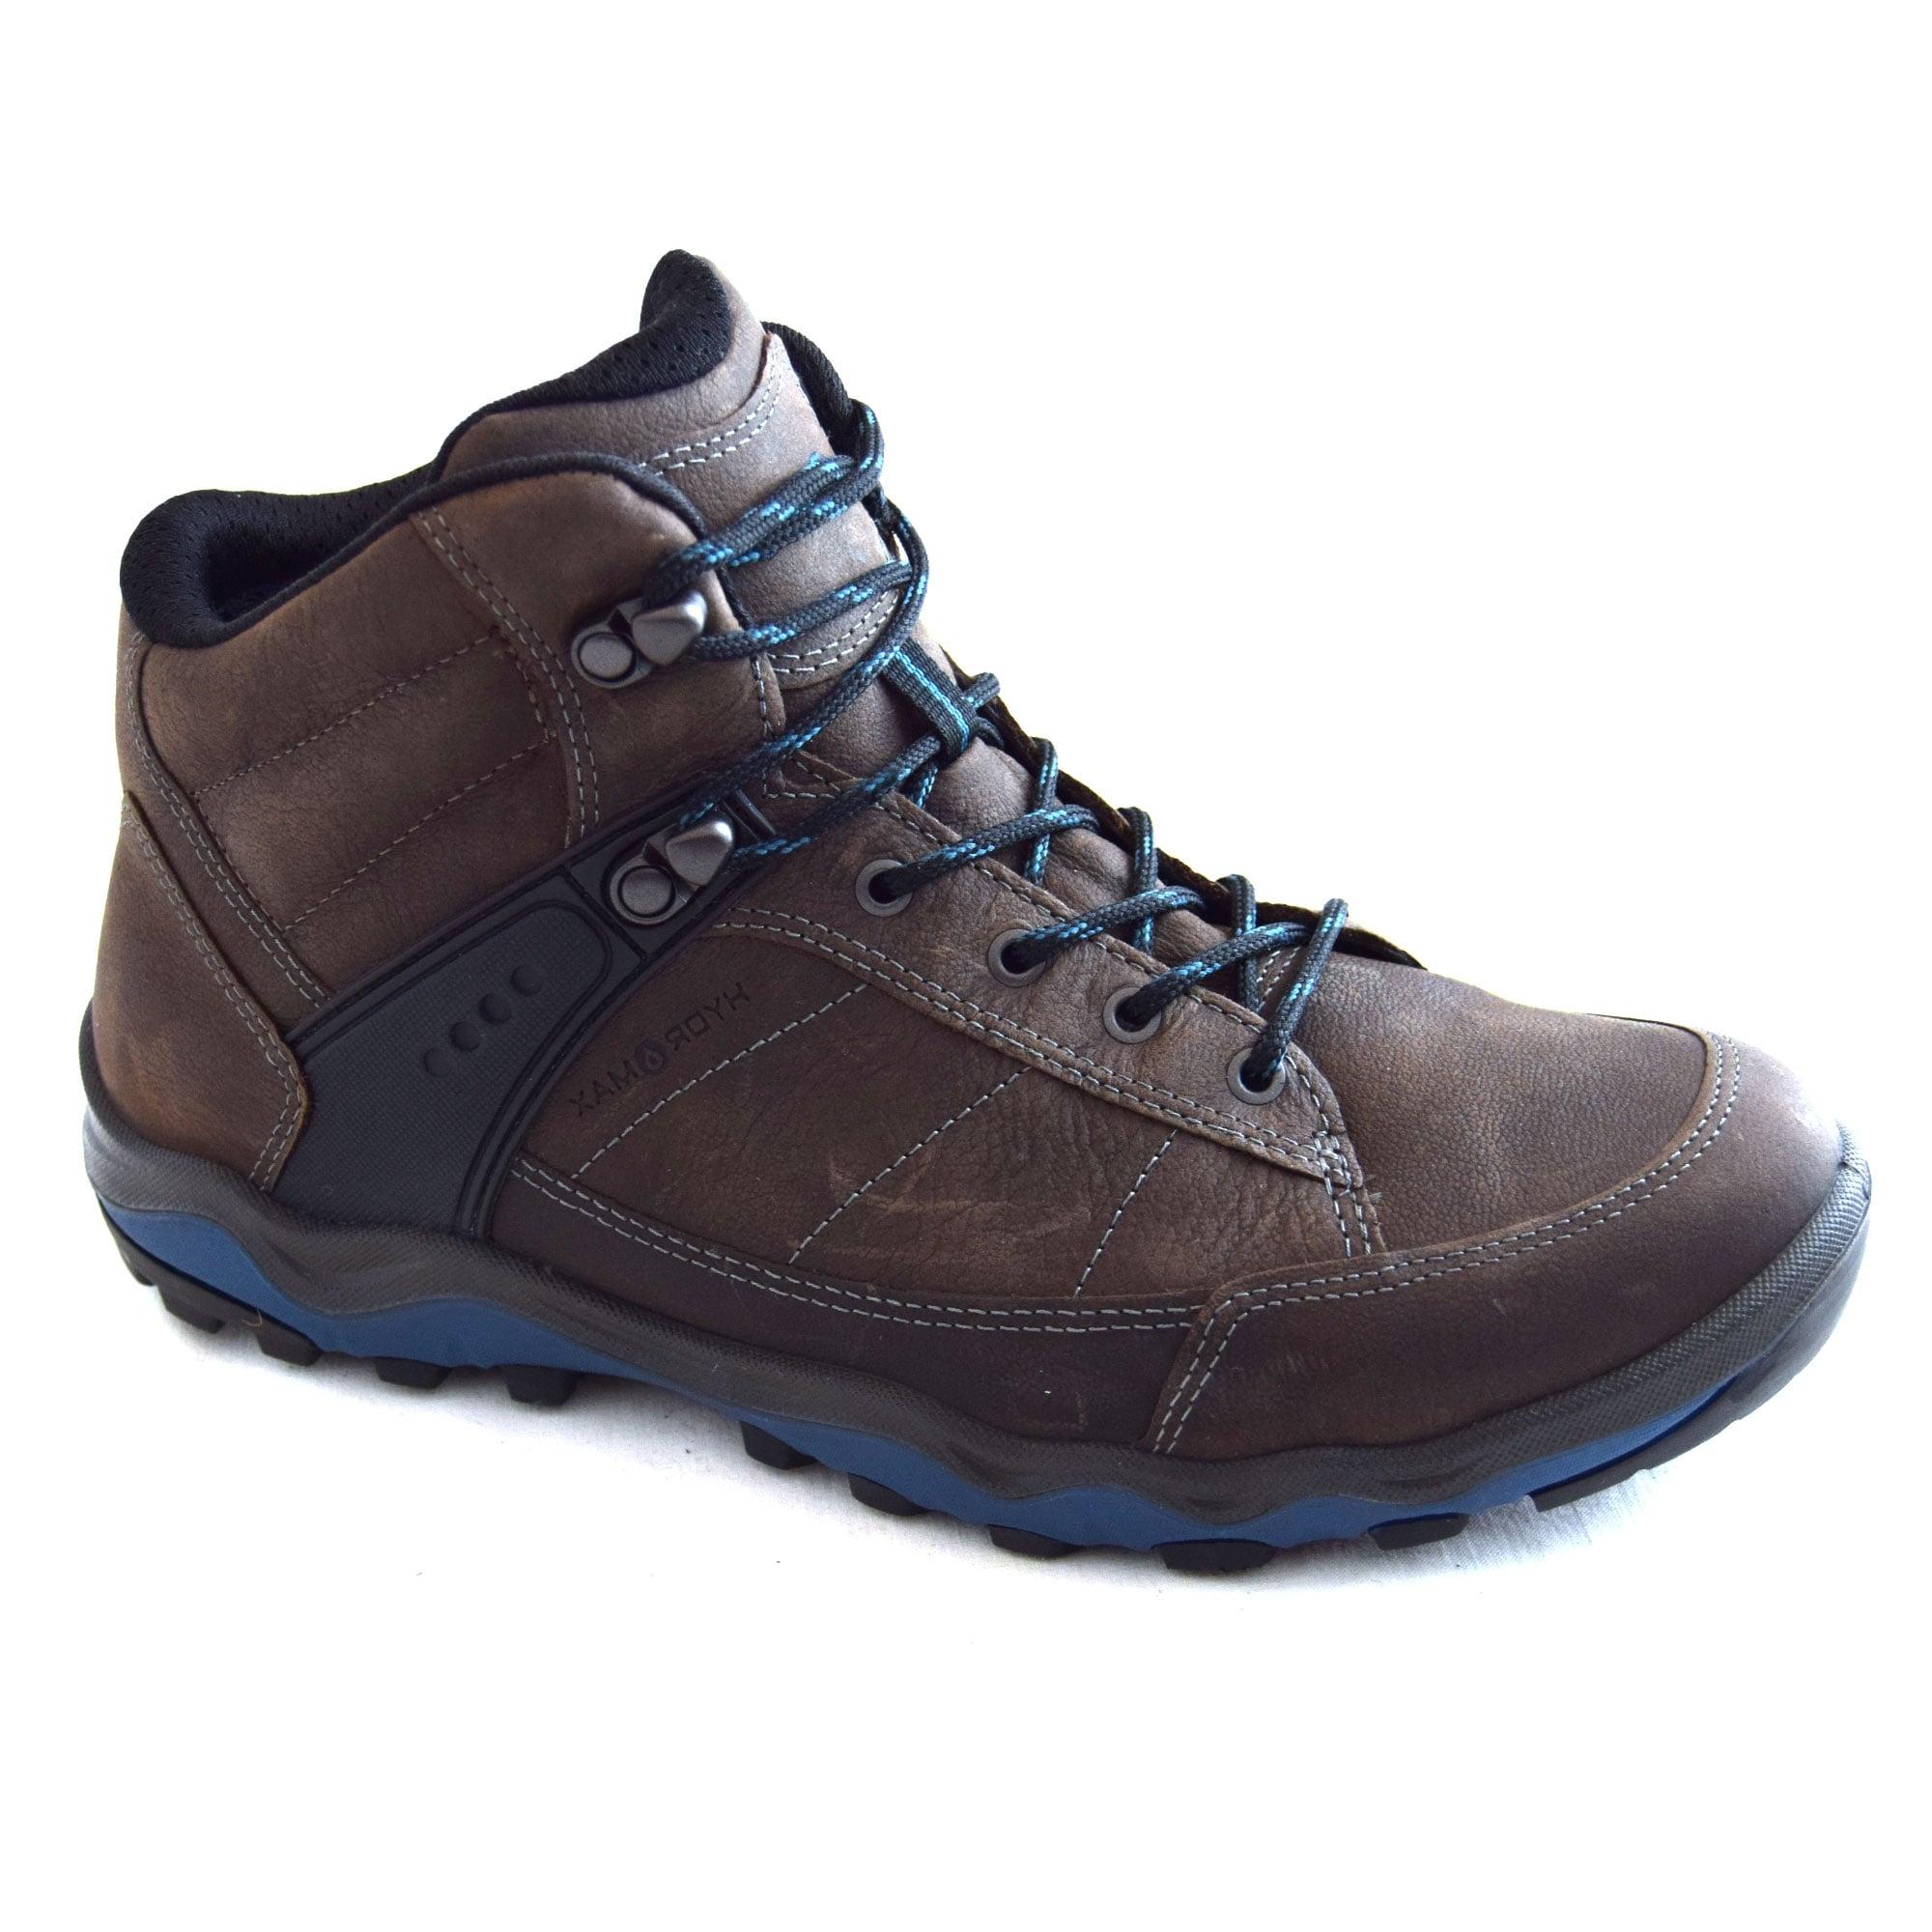 ecco ladies walking boots